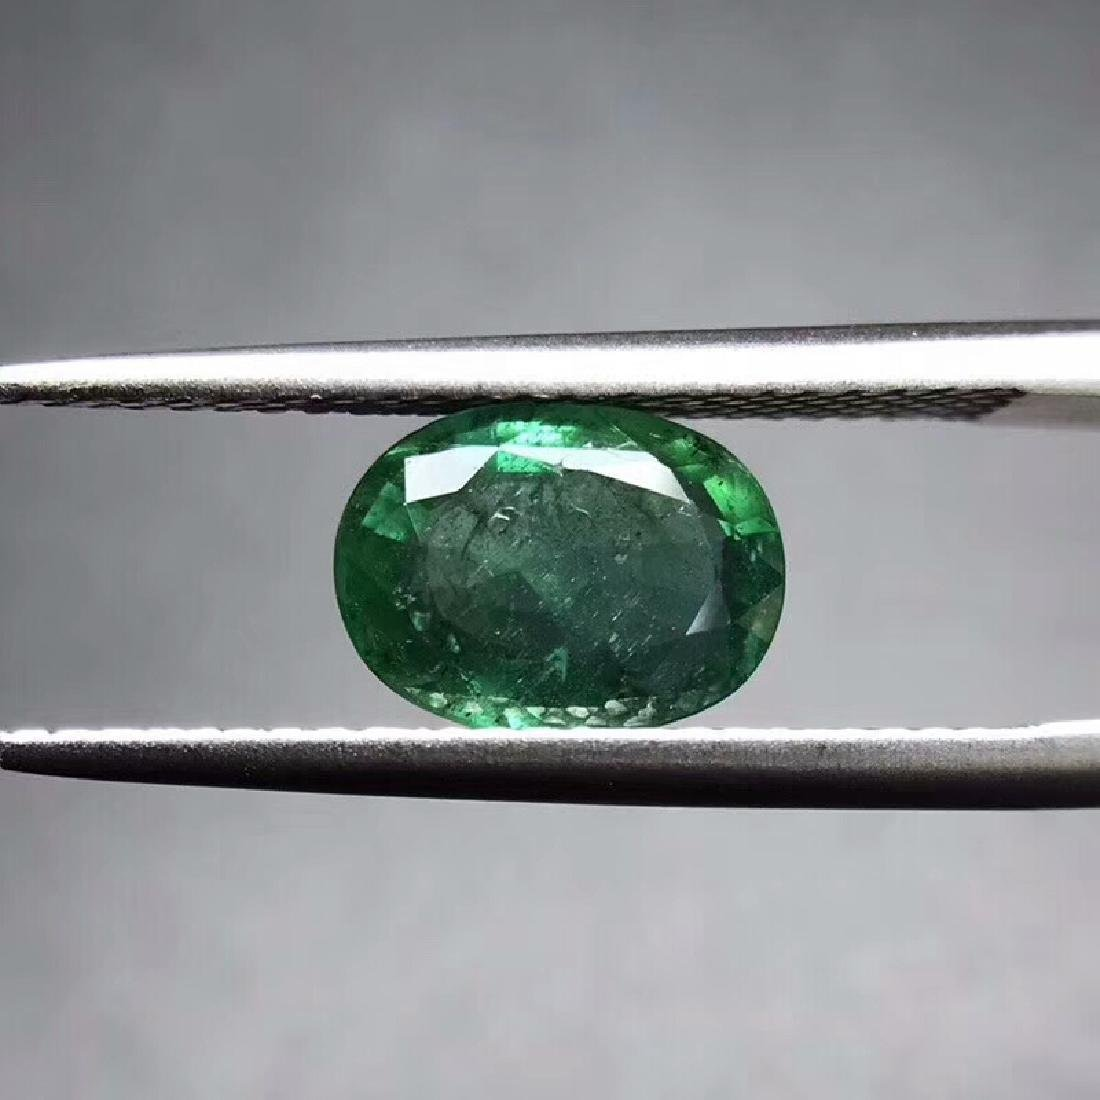 1.44 ct Emerald 8.8*6.5*3.4 mm Oval Cut